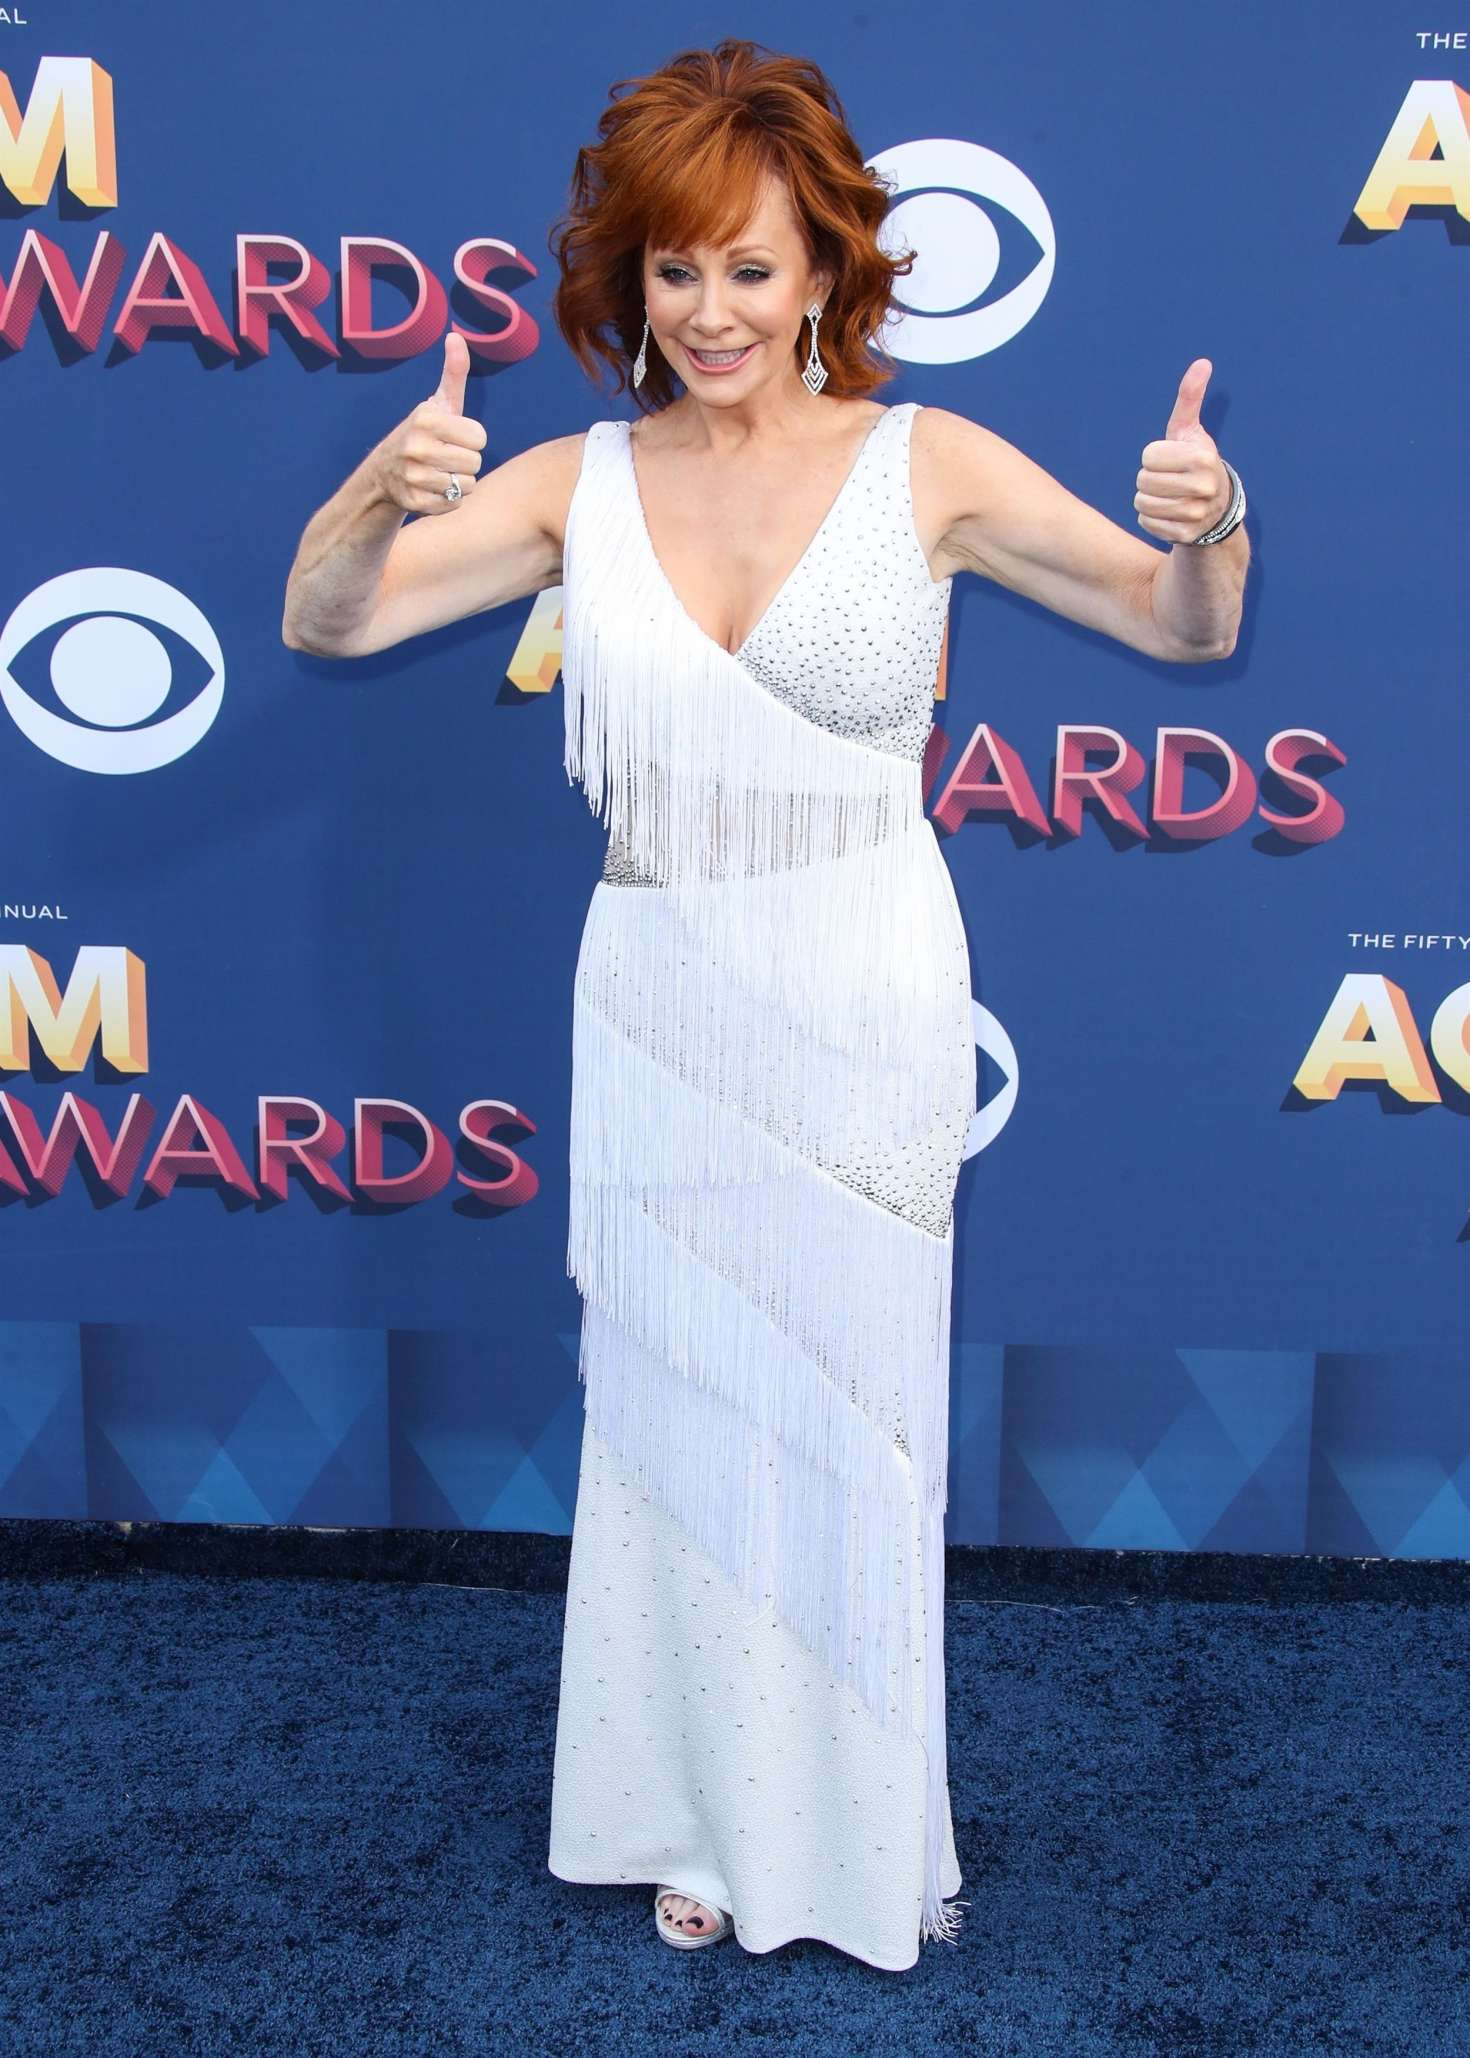 Reba Mcentire 2018 : Reba McEntire: 2018 Academy of Country Music Awards -05